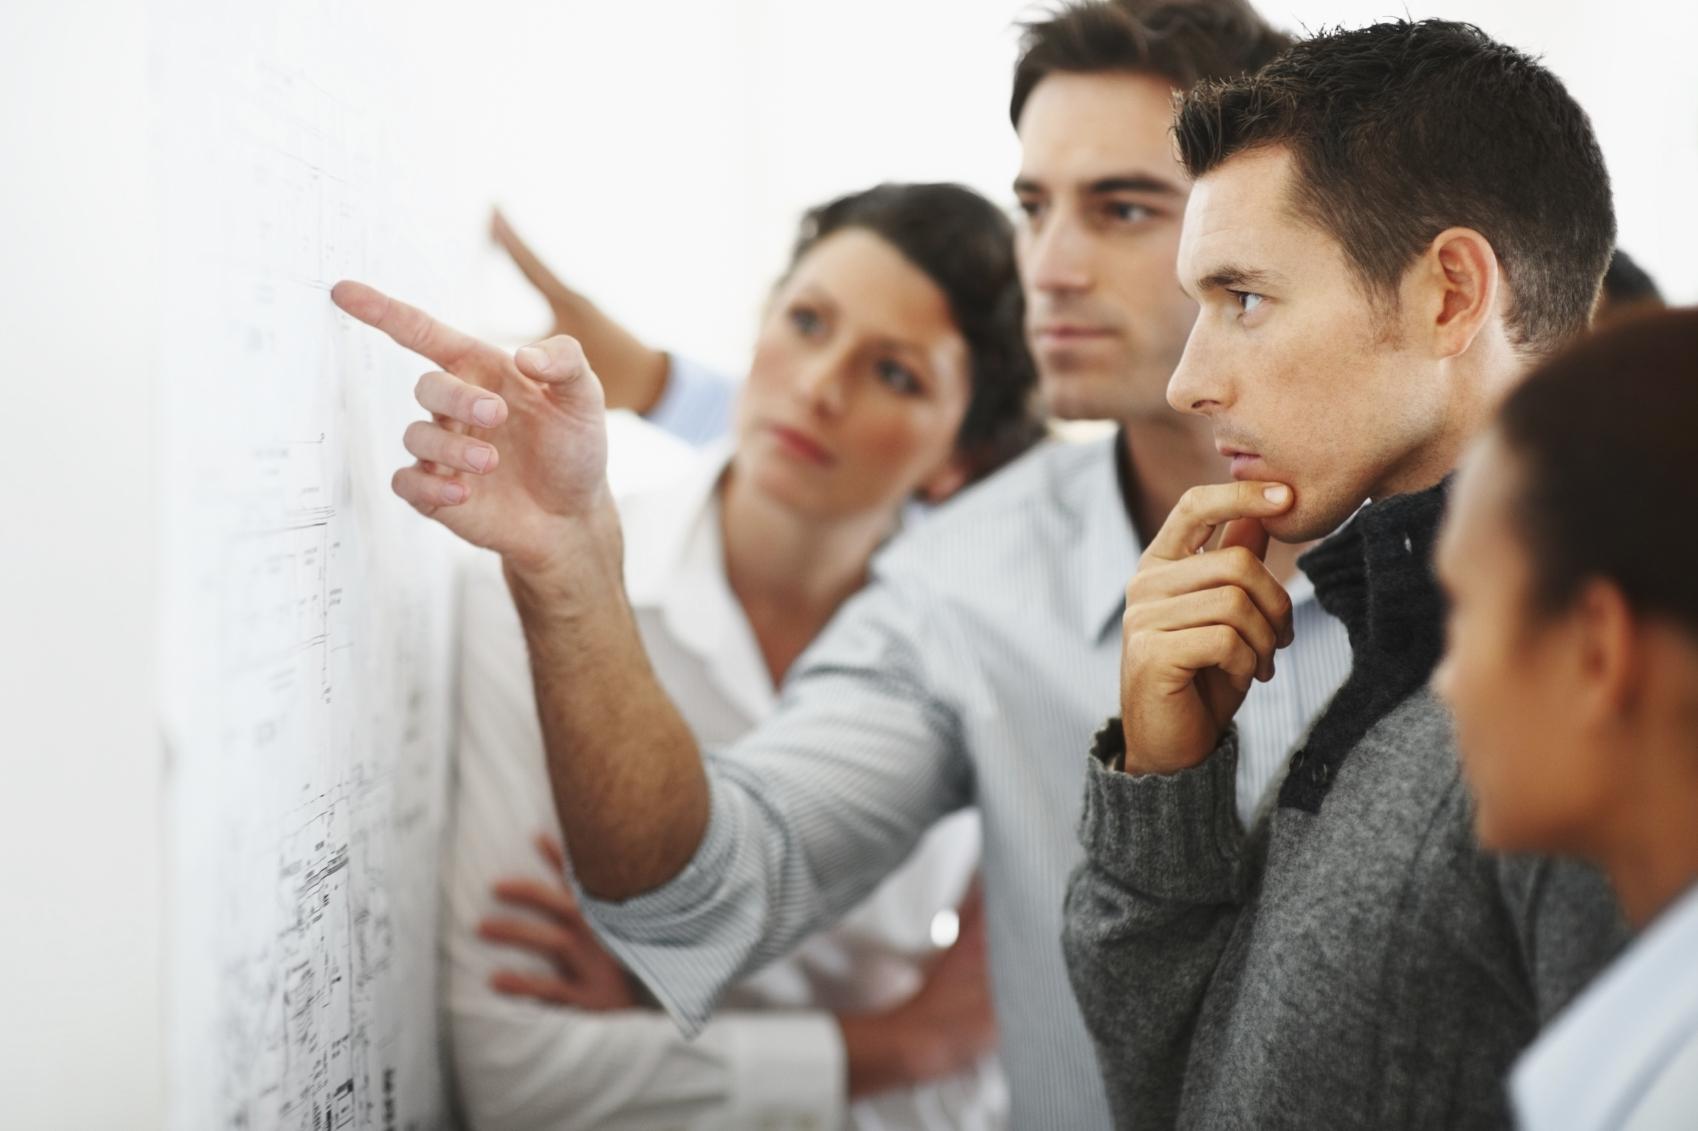 executives_team_working_whiteboard